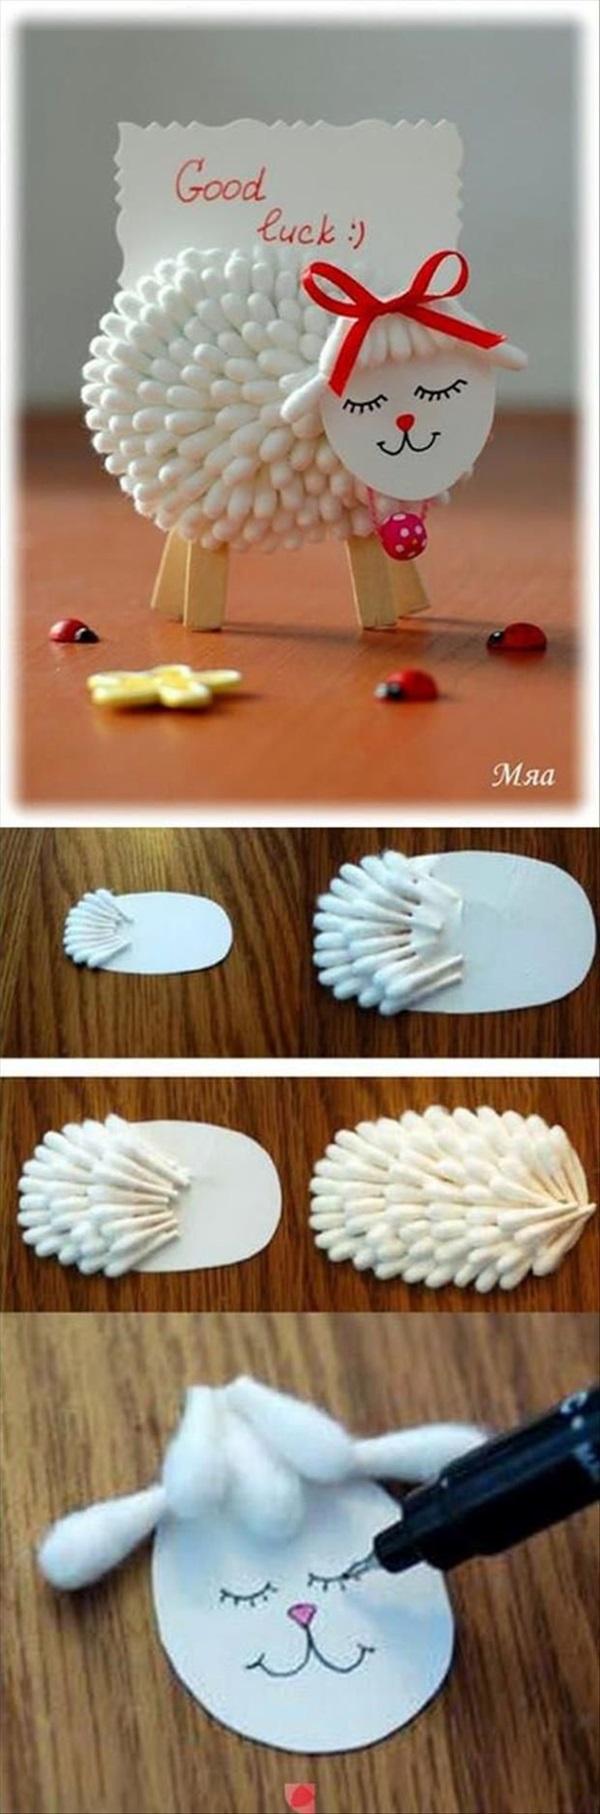 Homemade Christmas Gift Ideas (10)